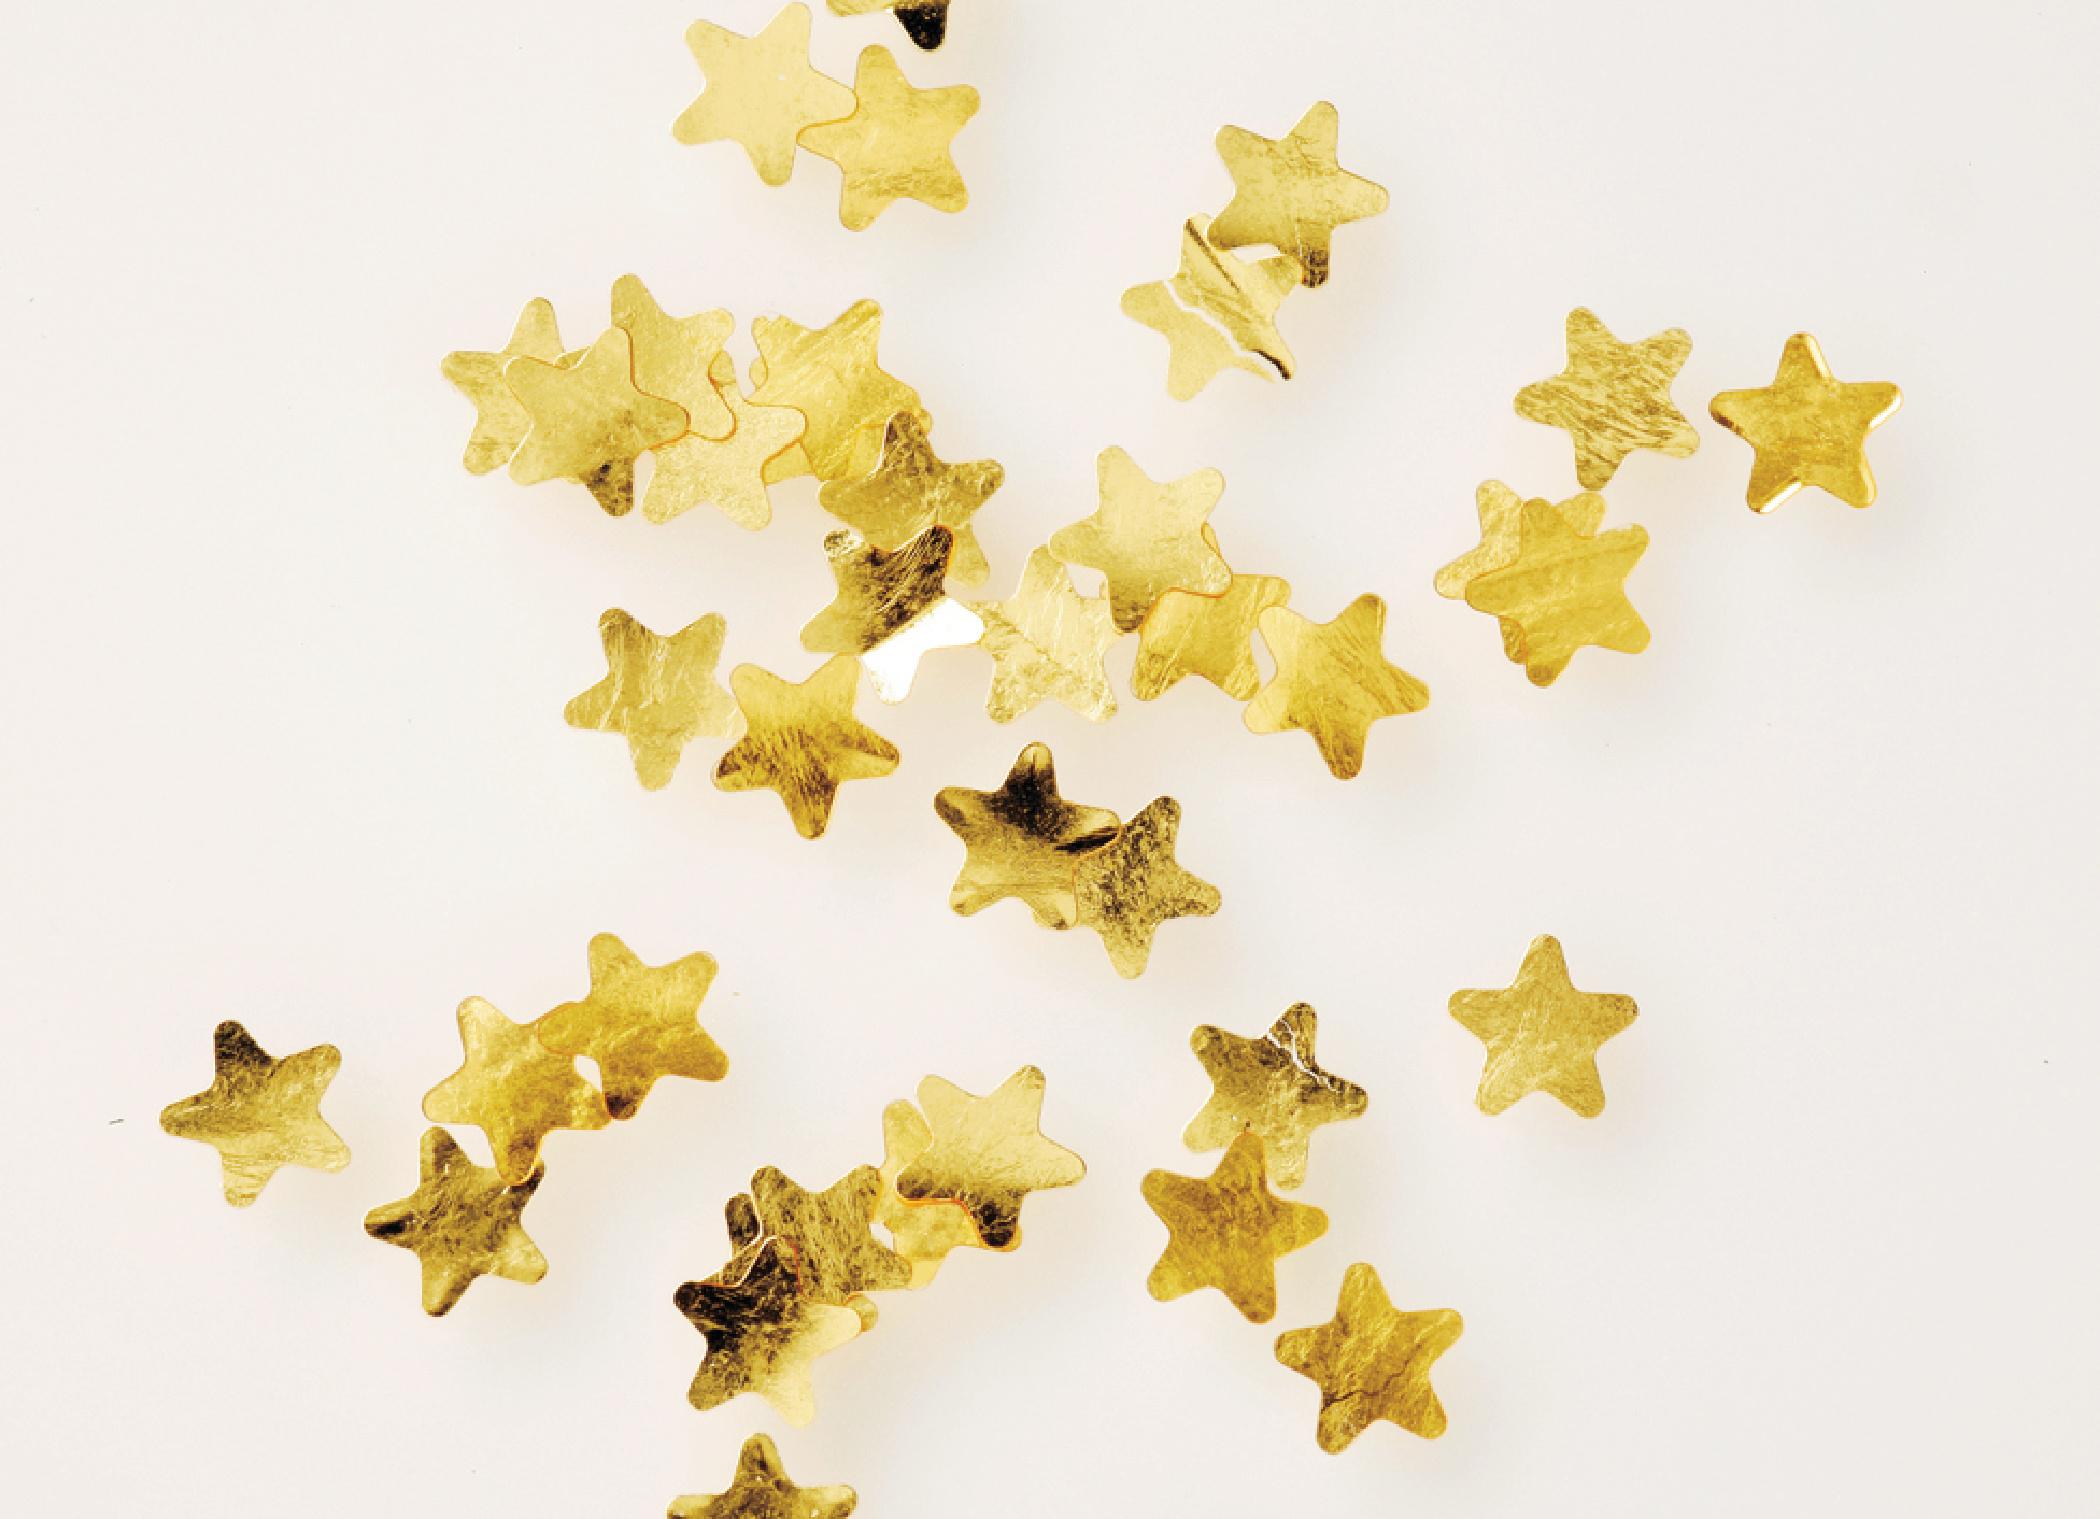 Hakuichi gold star 3.0mm